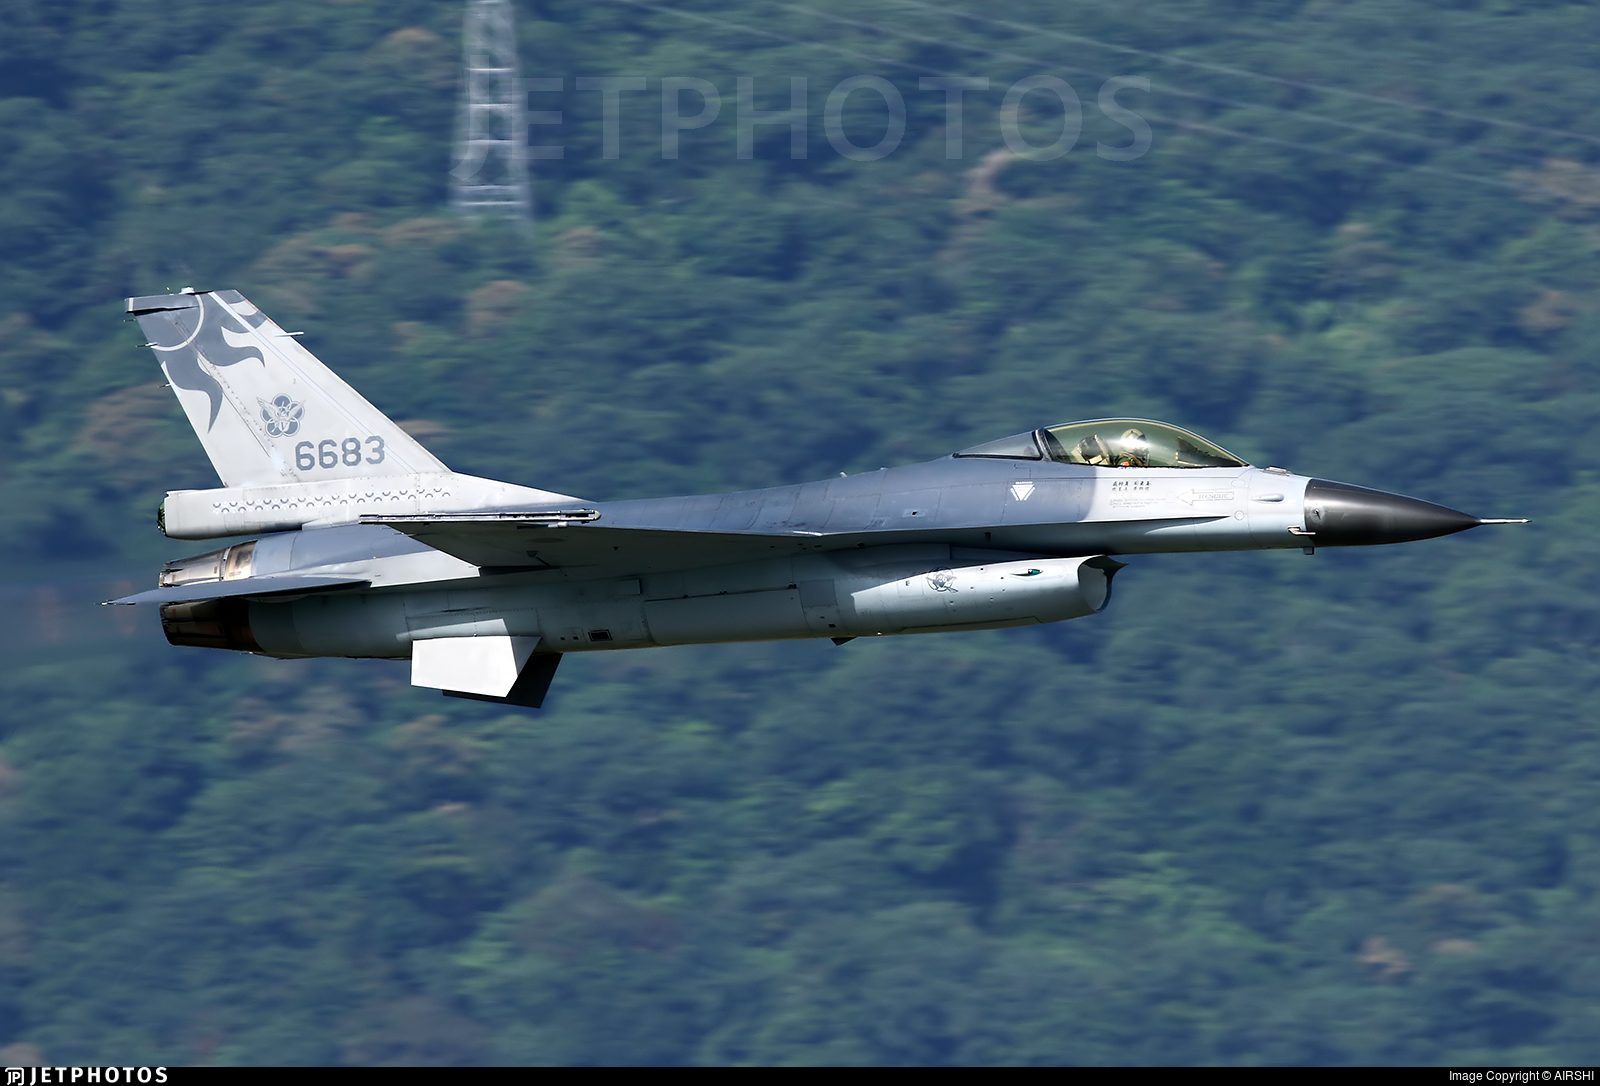 6683 - General Dynamics F-16AM Fighting Falcon - Taiwan - Air Force